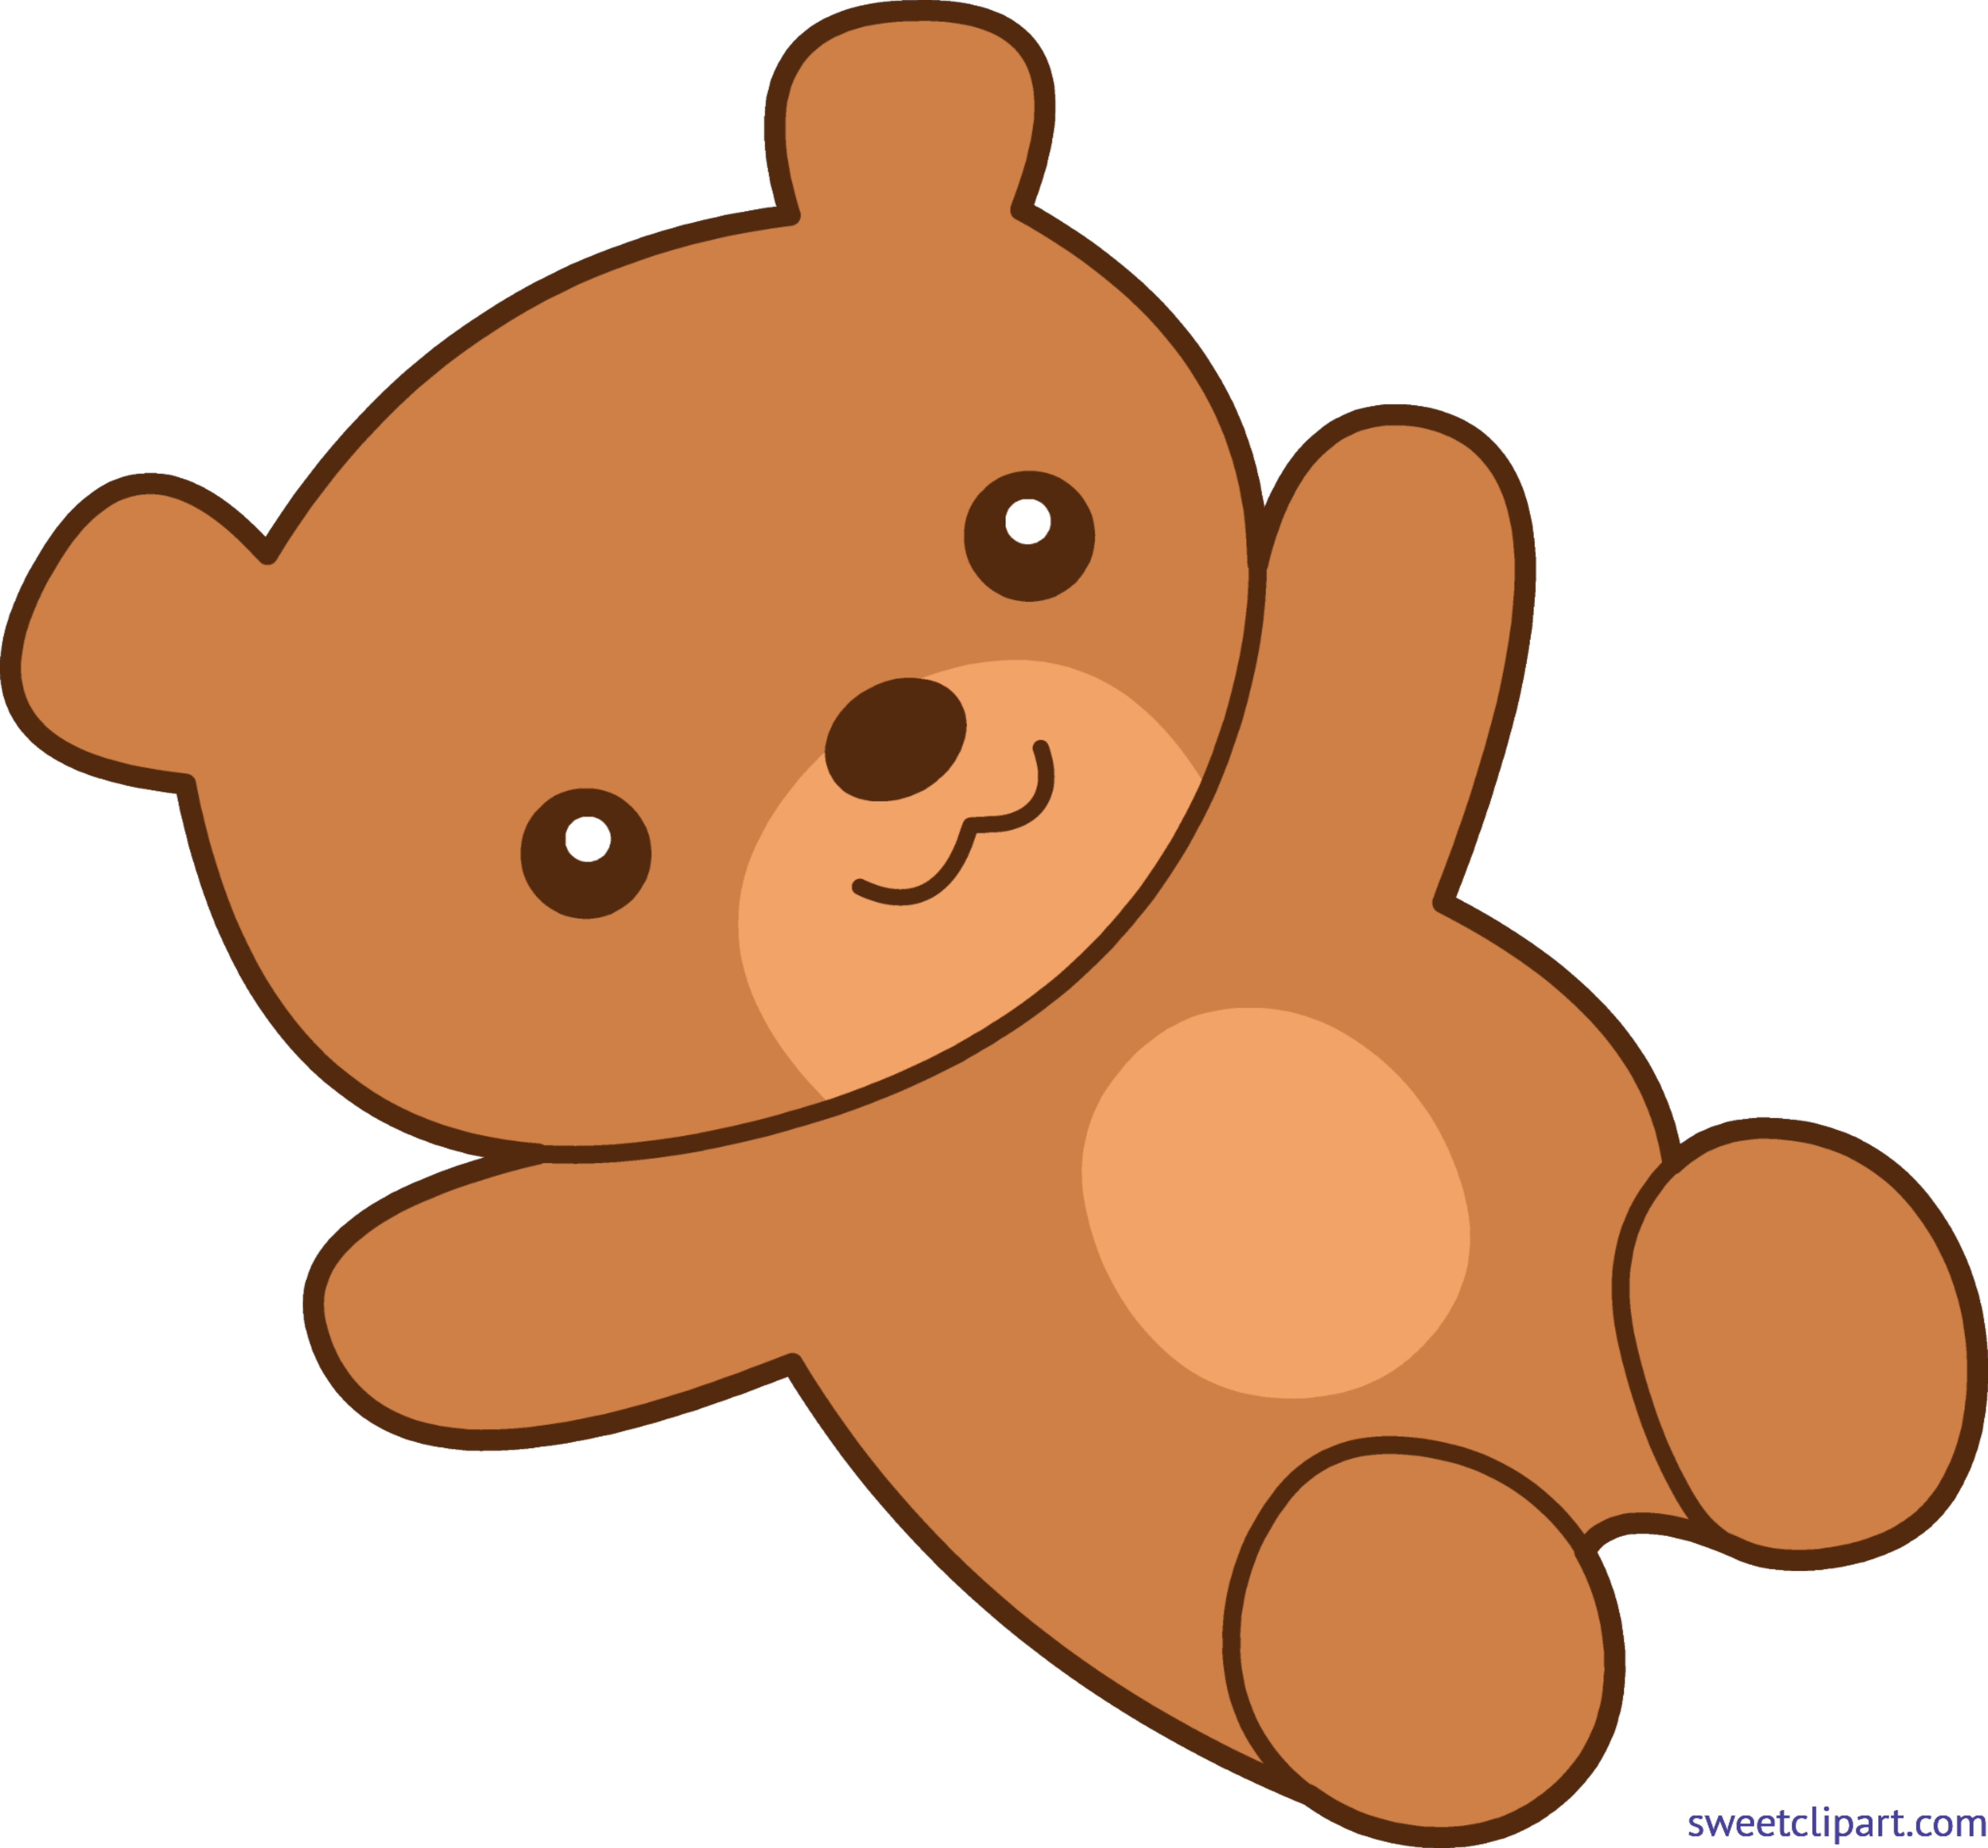 Medical clipart teddy bear. Brown clip art sweet